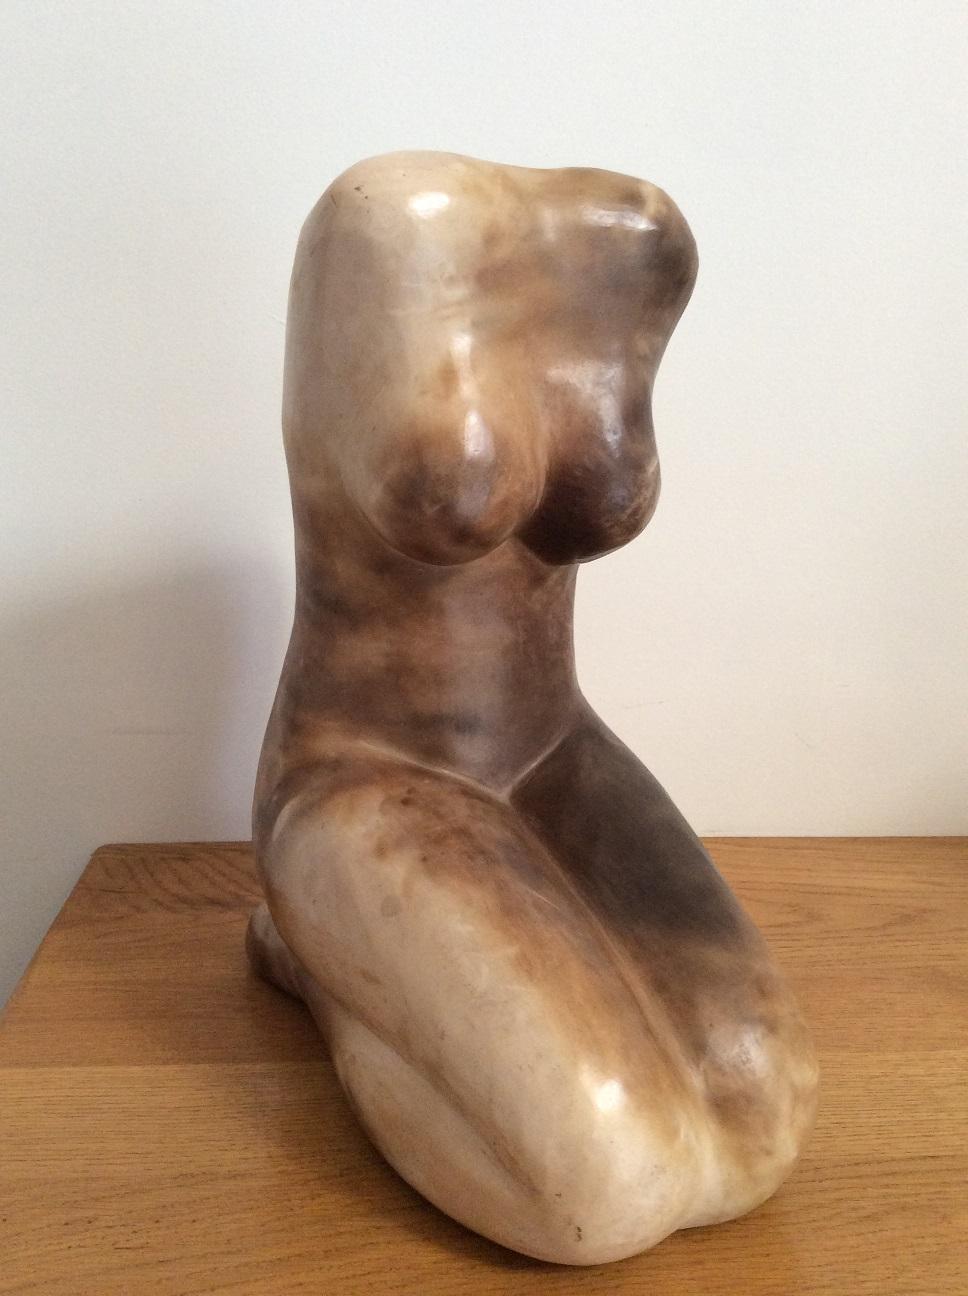 buste terre enfume paille sculpture terre cuite buste femme christine lambert